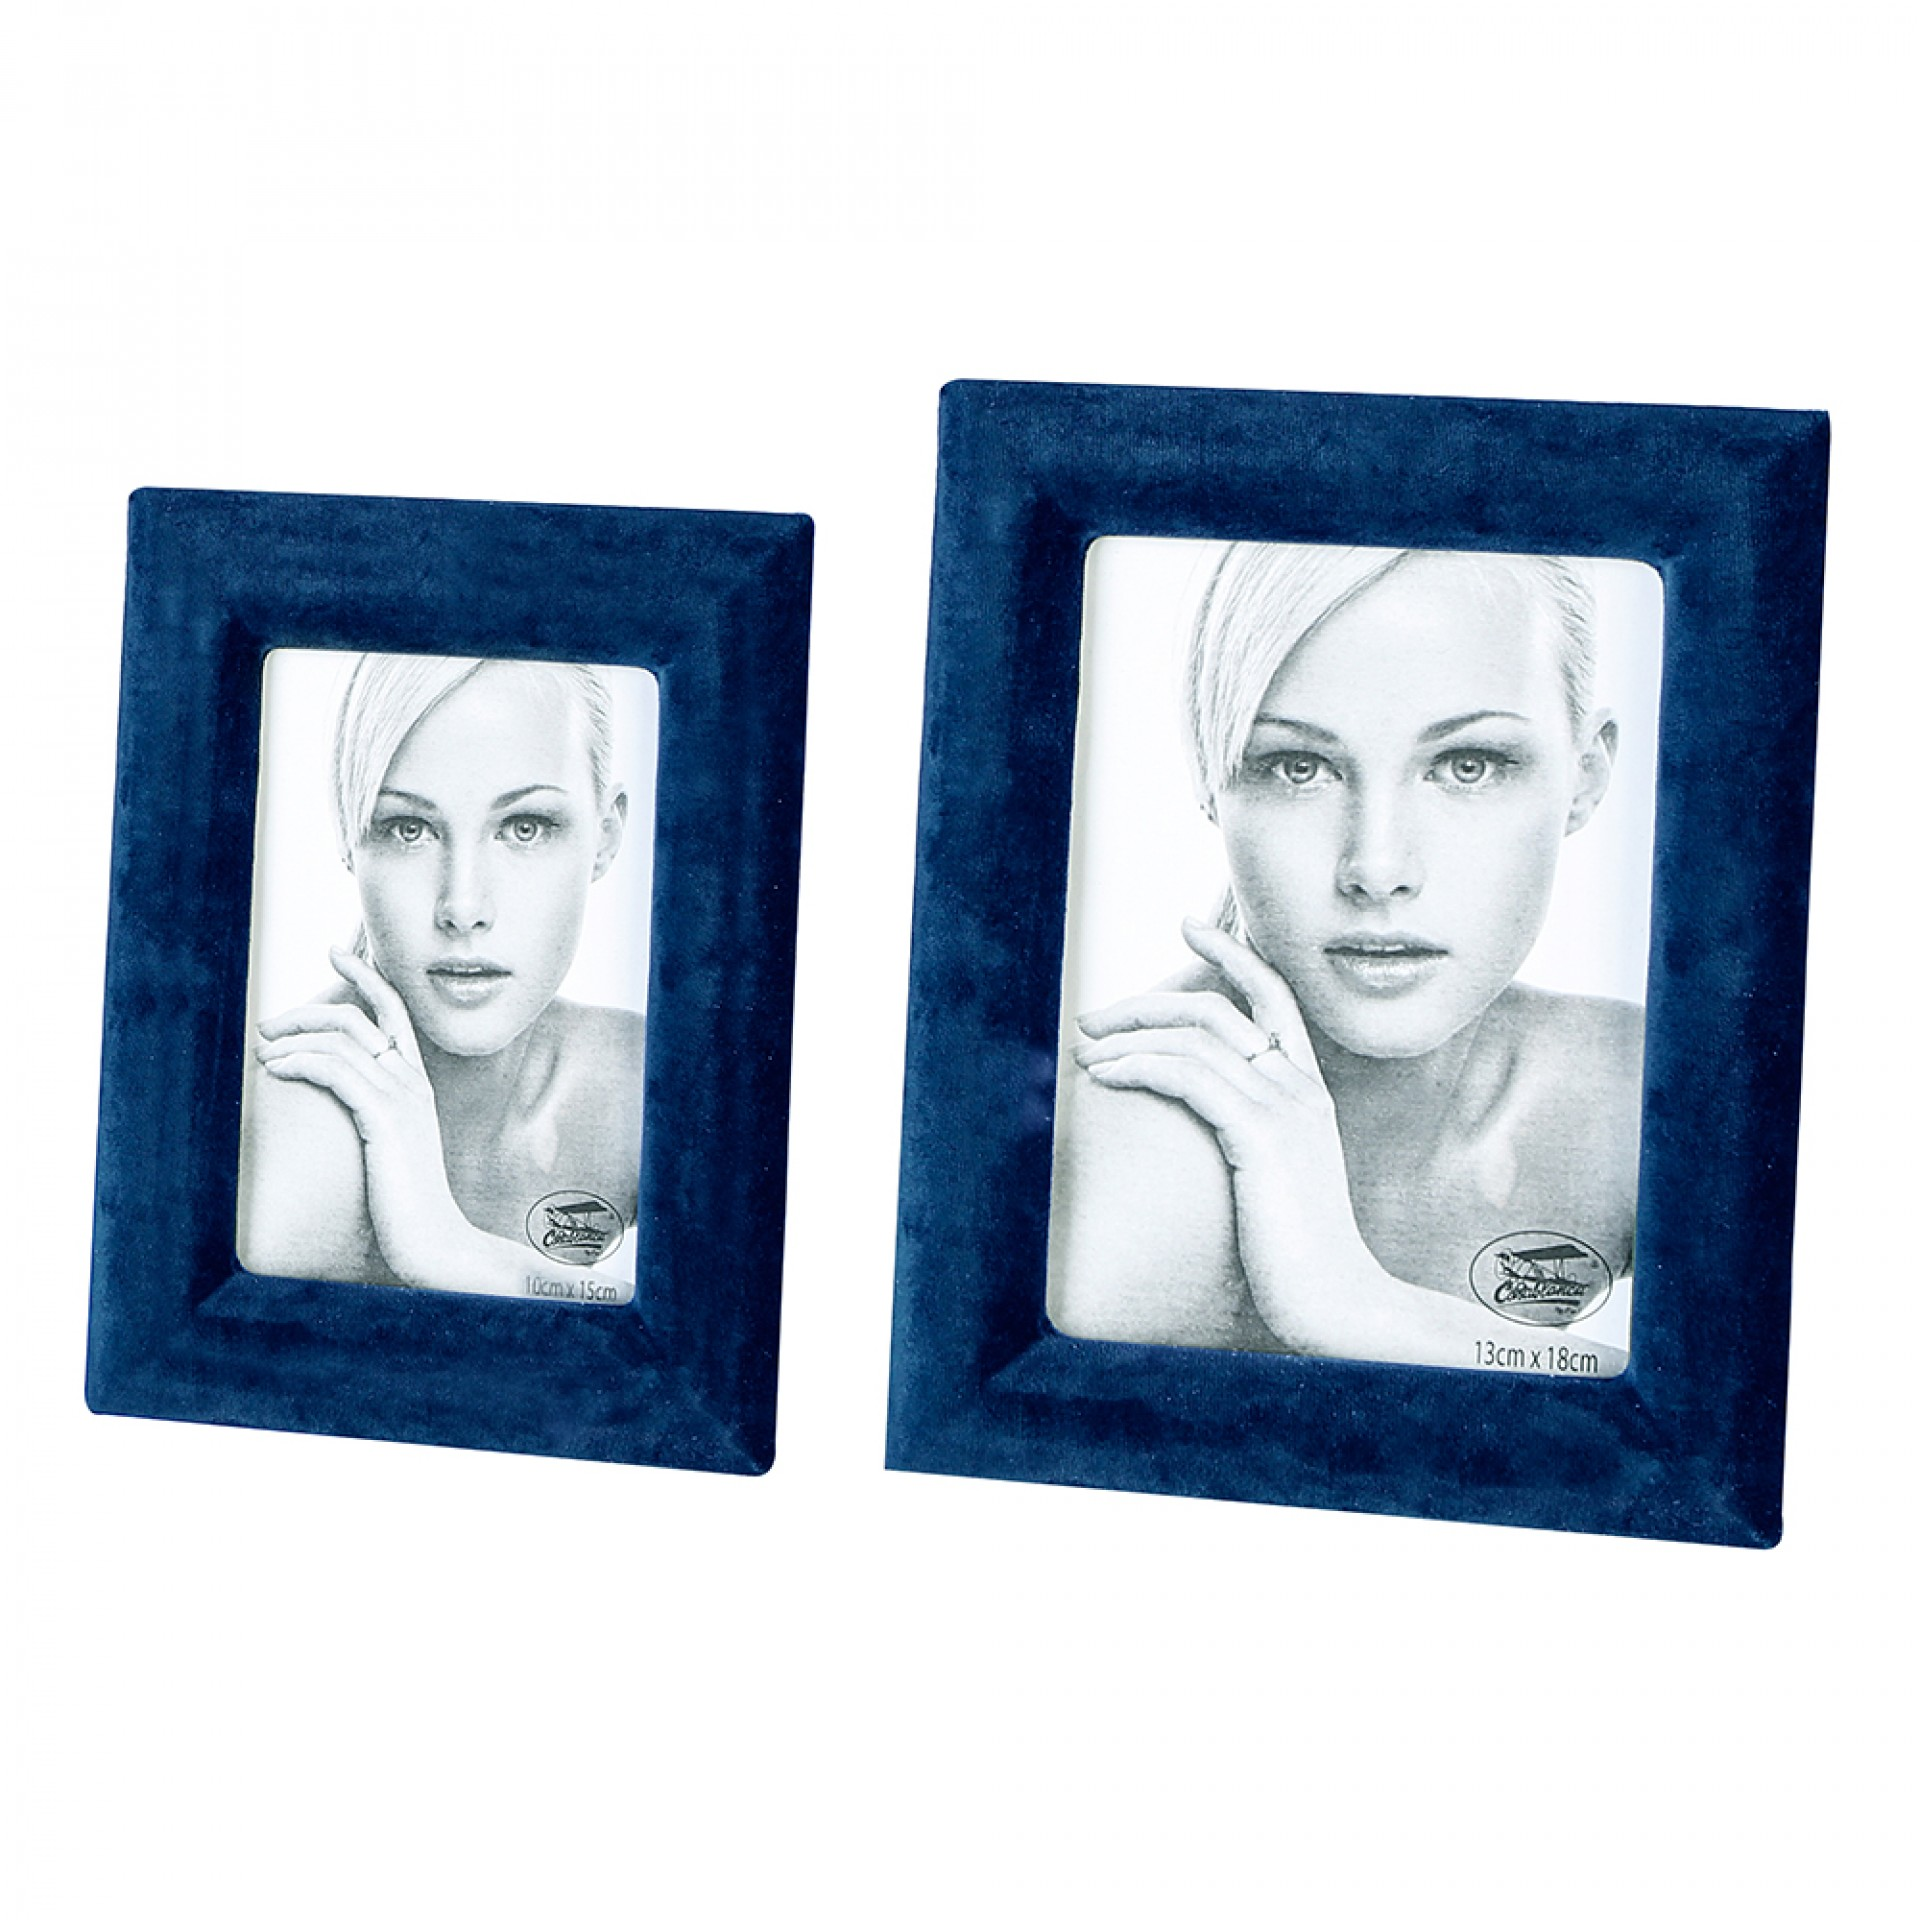 Rámeček na fotky Royal, 20x15,5 cm, modrý samet